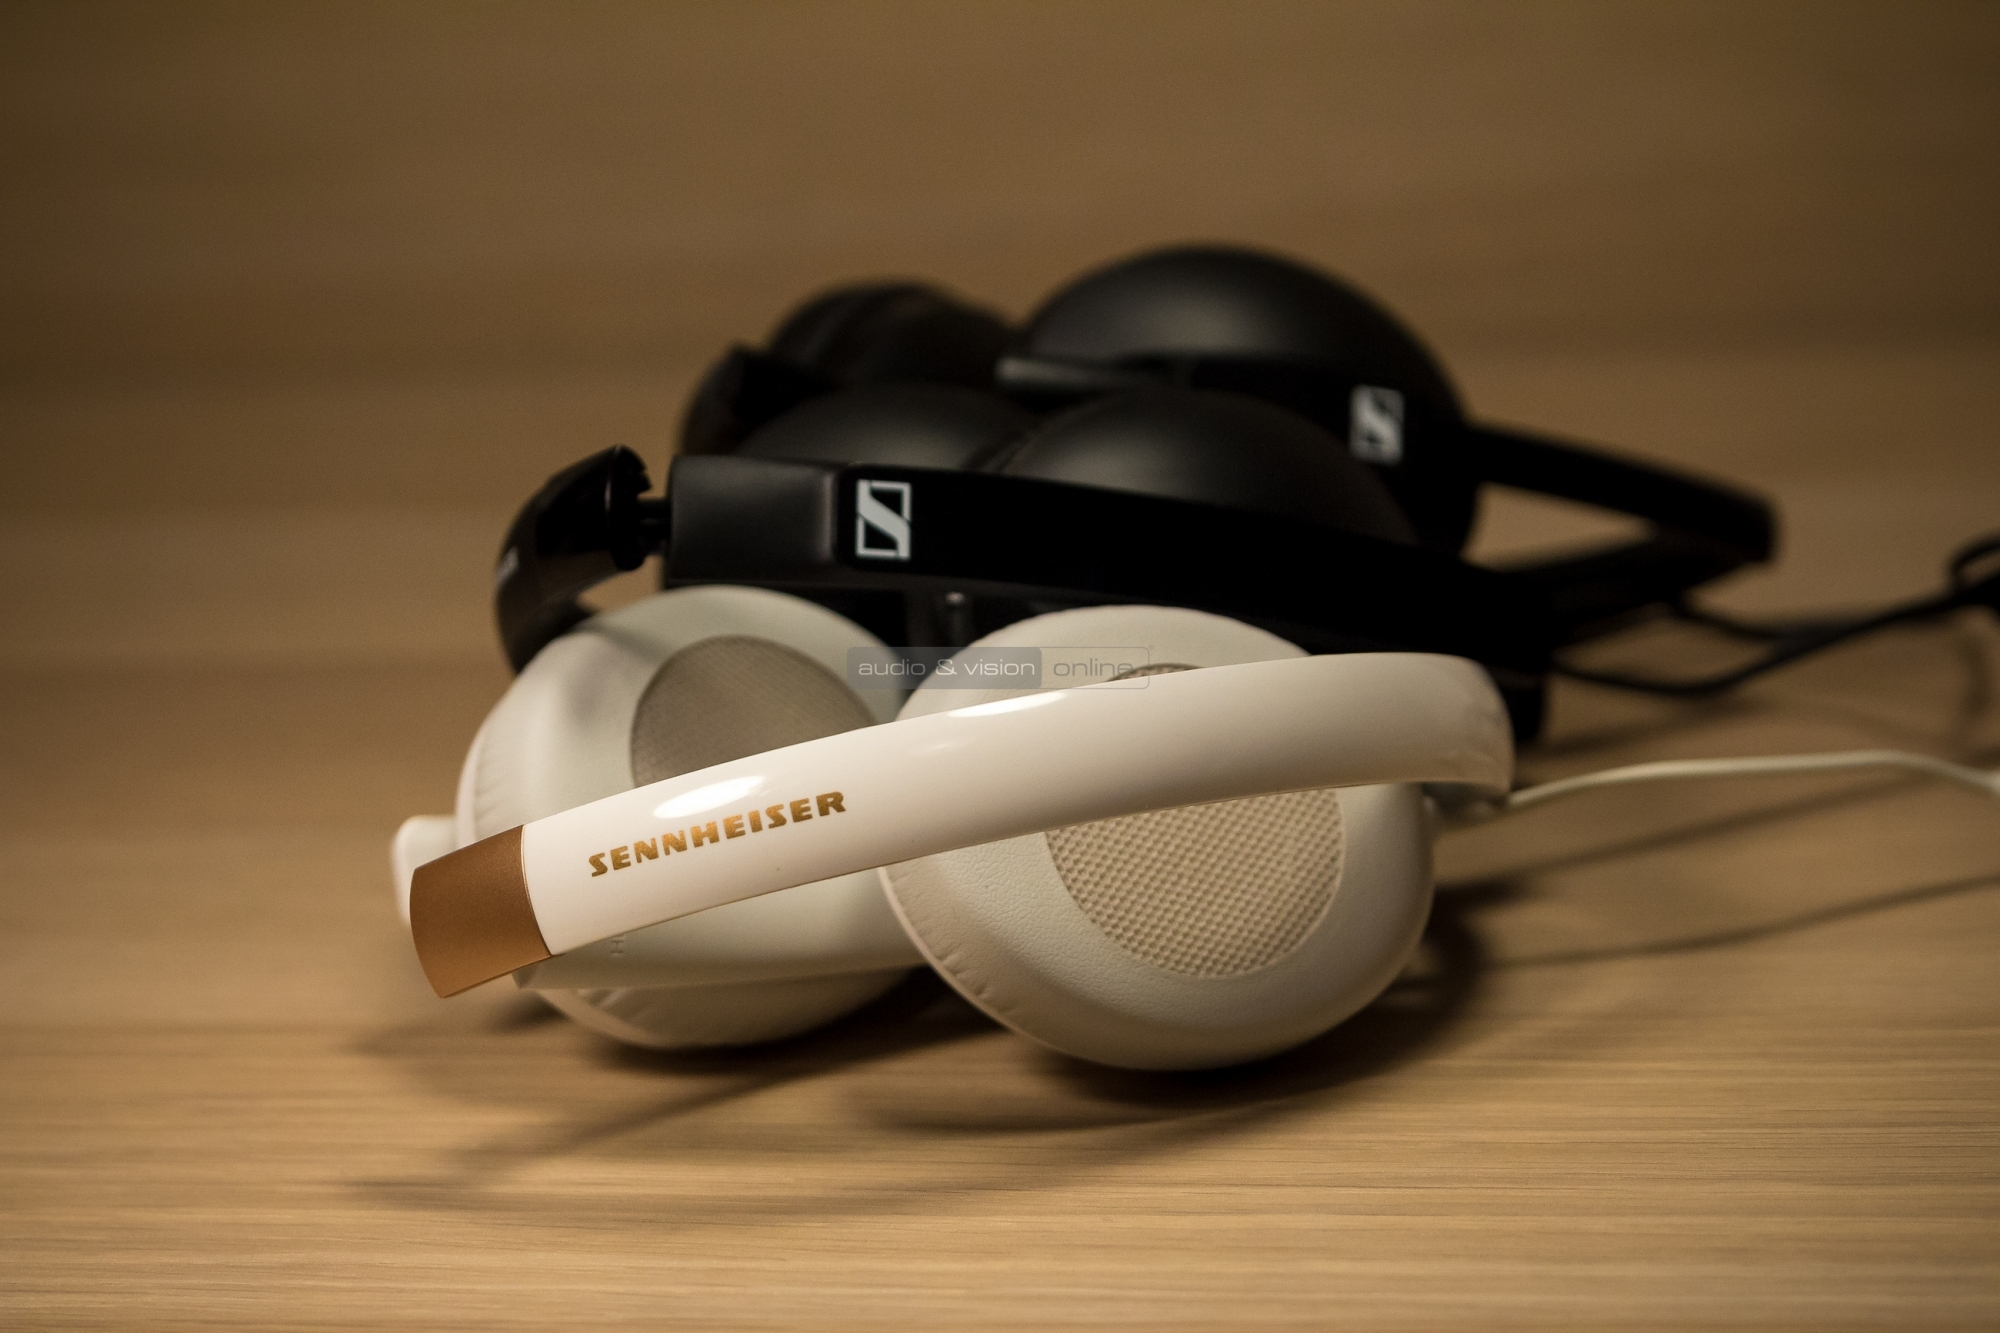 Sennheiser Hd 210 220s S 230i Fejhallgatk Tesztje Av Headphone Kattints